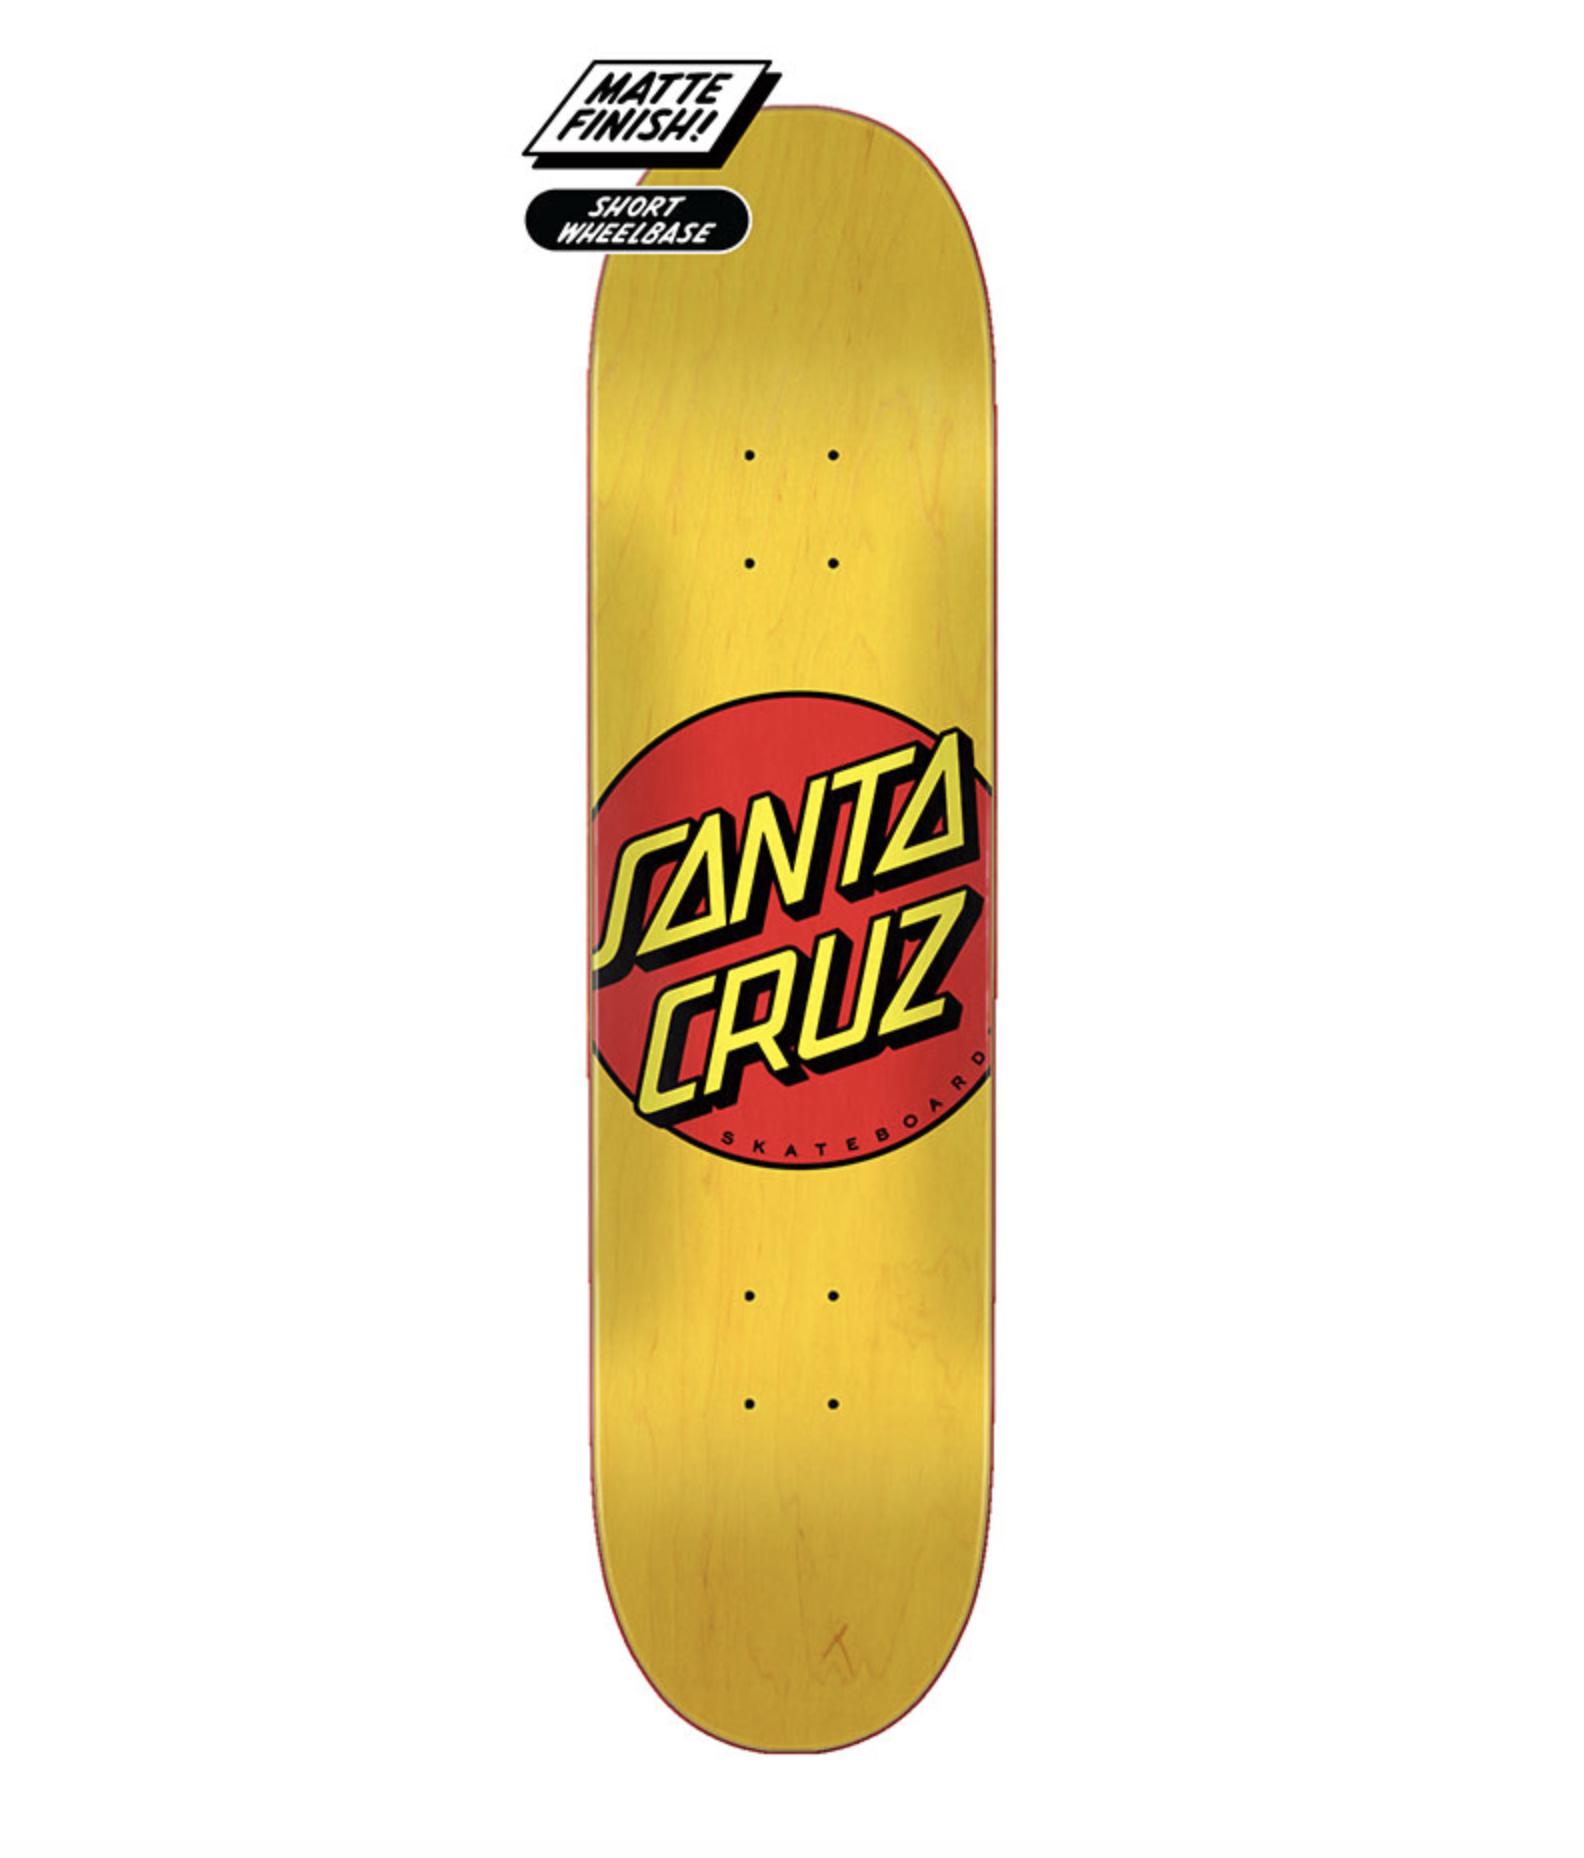 Santa Cruz DECK-SANTA CRUZ CLASSIC DOT (7.75)